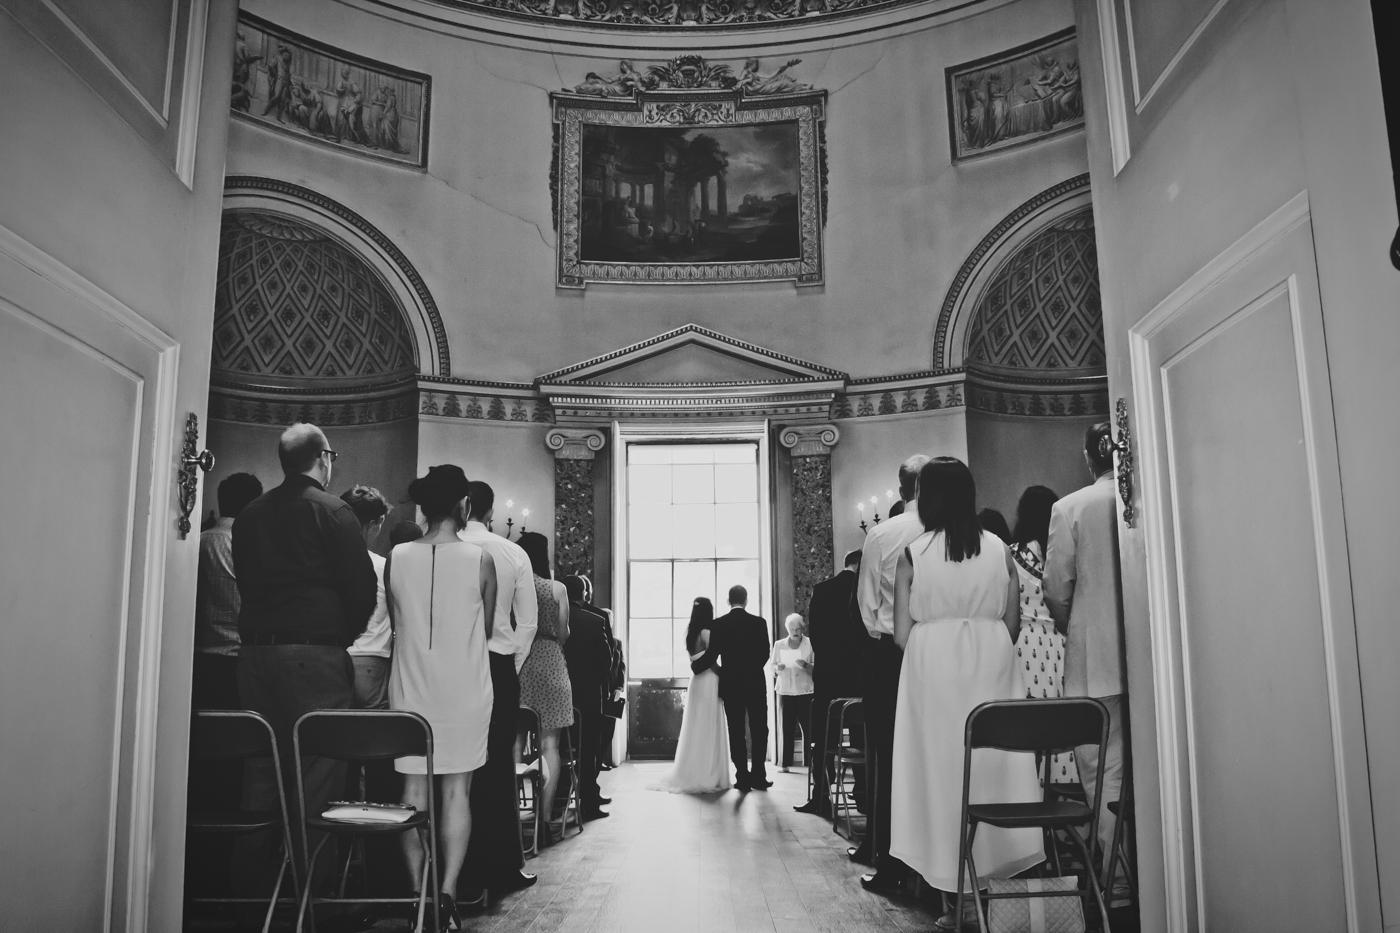 066 - Abi and Chris at Kedleston Hall - Wedding Photography by Mark Pugh www.markpugh.com - 5350.JPG